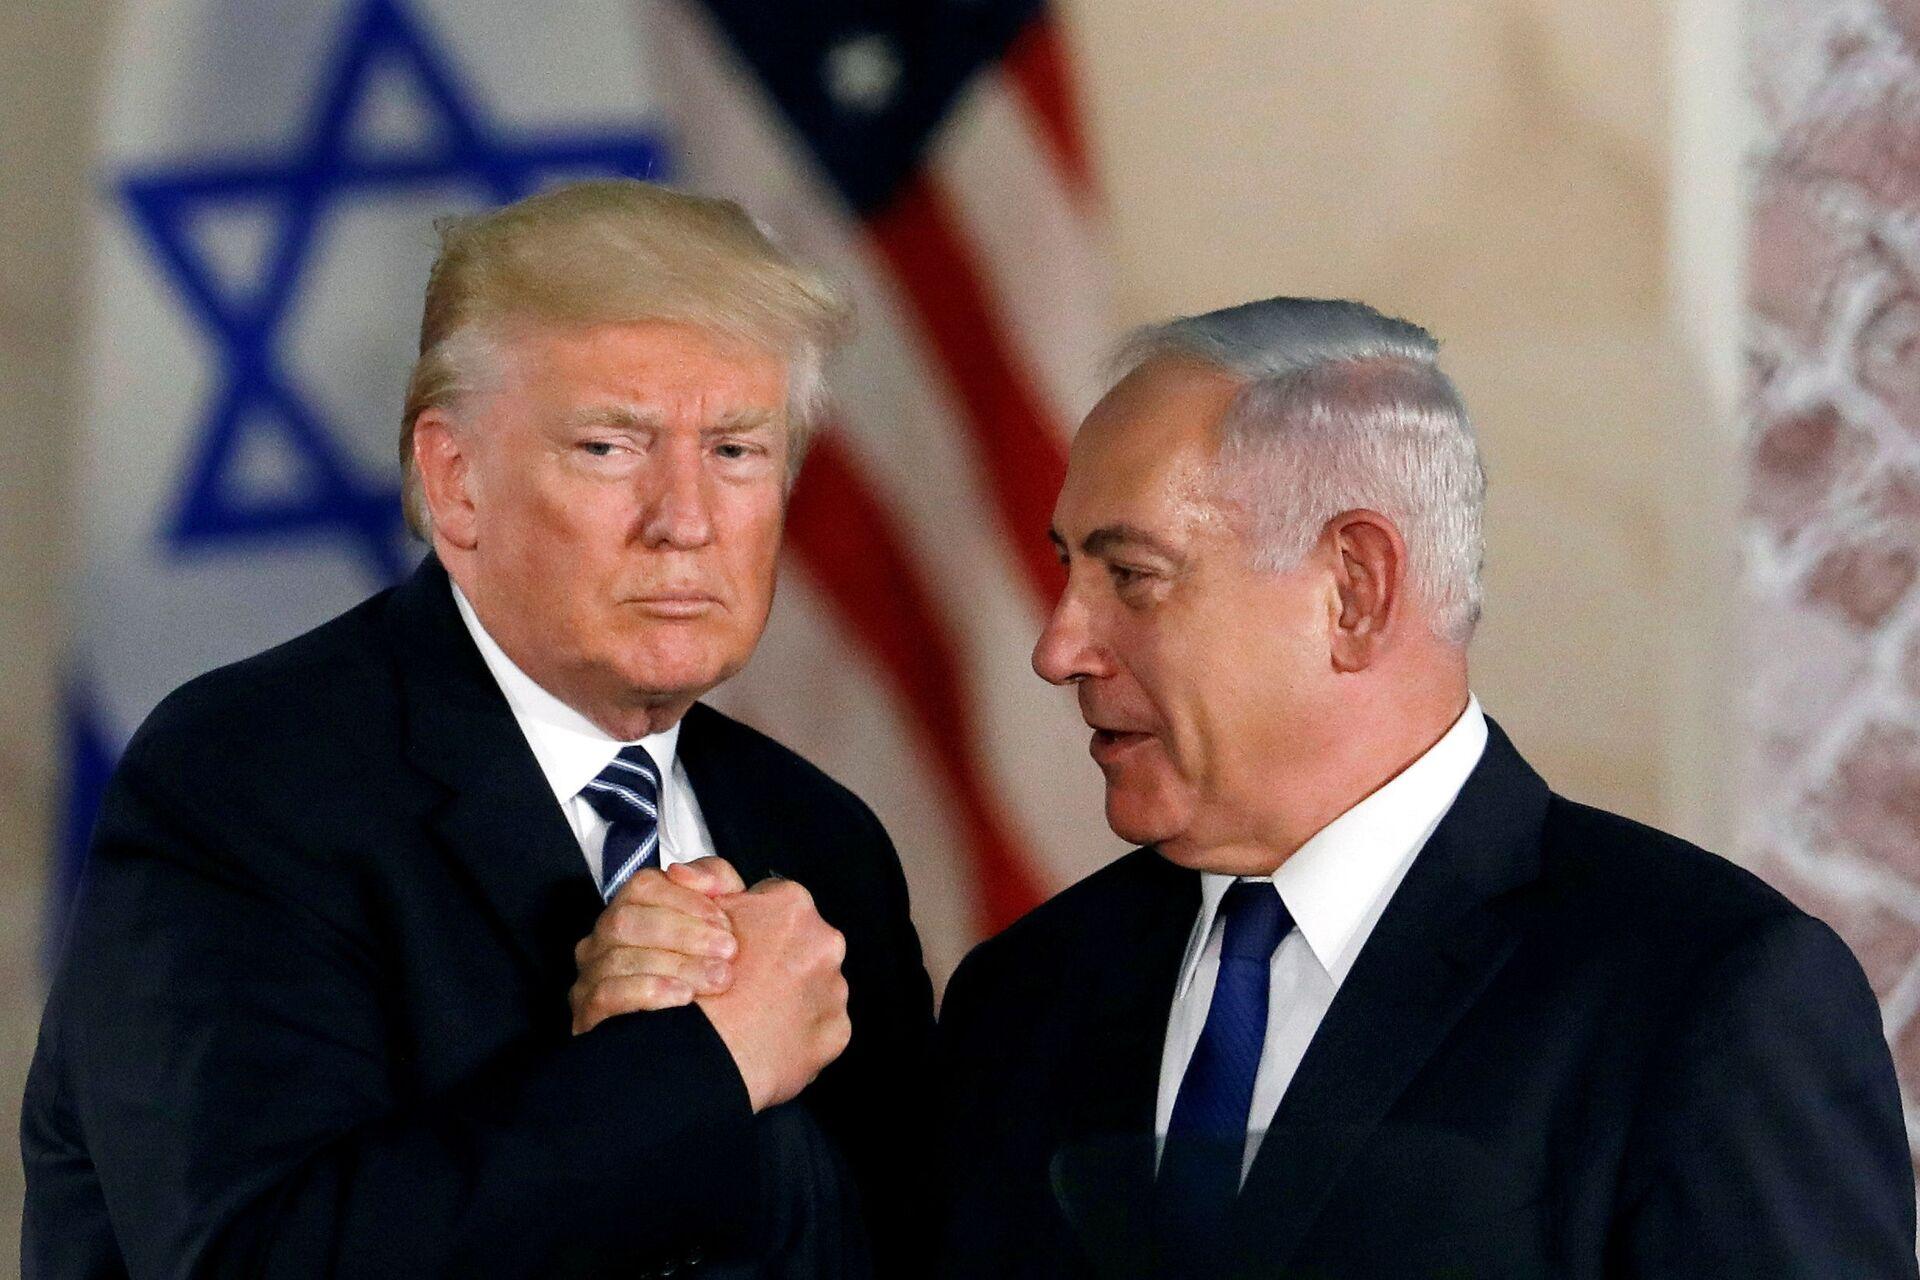 U.S. President Donald Trump and Israeli Prime Minister Benjamin Netanyahu shake hands after Trump's address at the Israel Museum in Jerusalem May 23, 2017. - Sputnik International, 1920, 11.09.2021